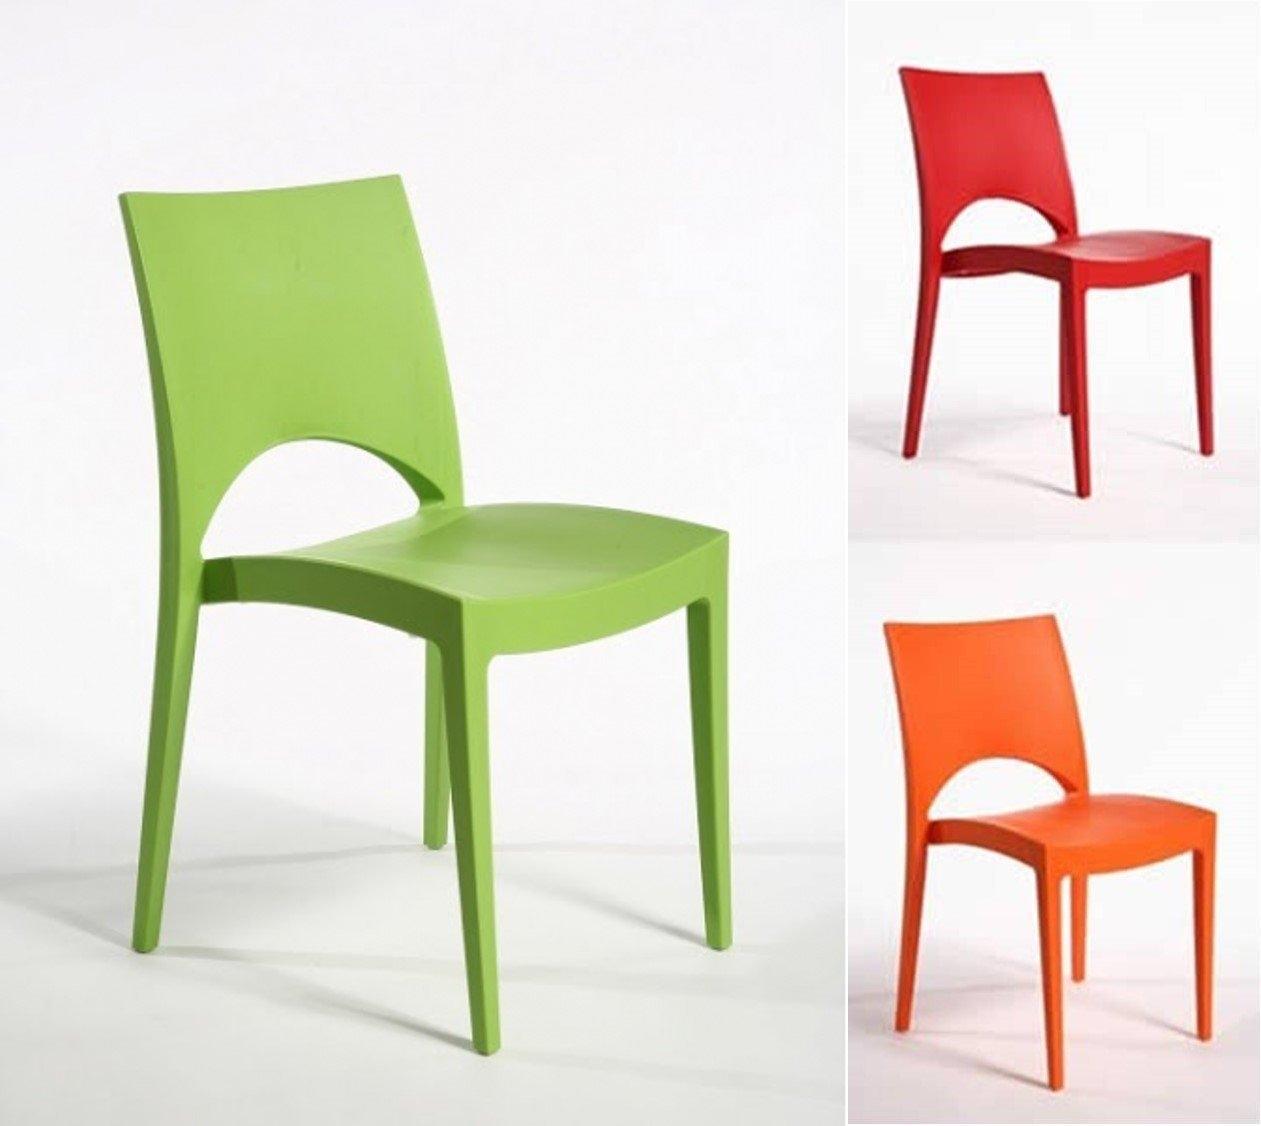 Sedia calligaris helios plastica sedie a prezzi scontati for Sedie prezzi